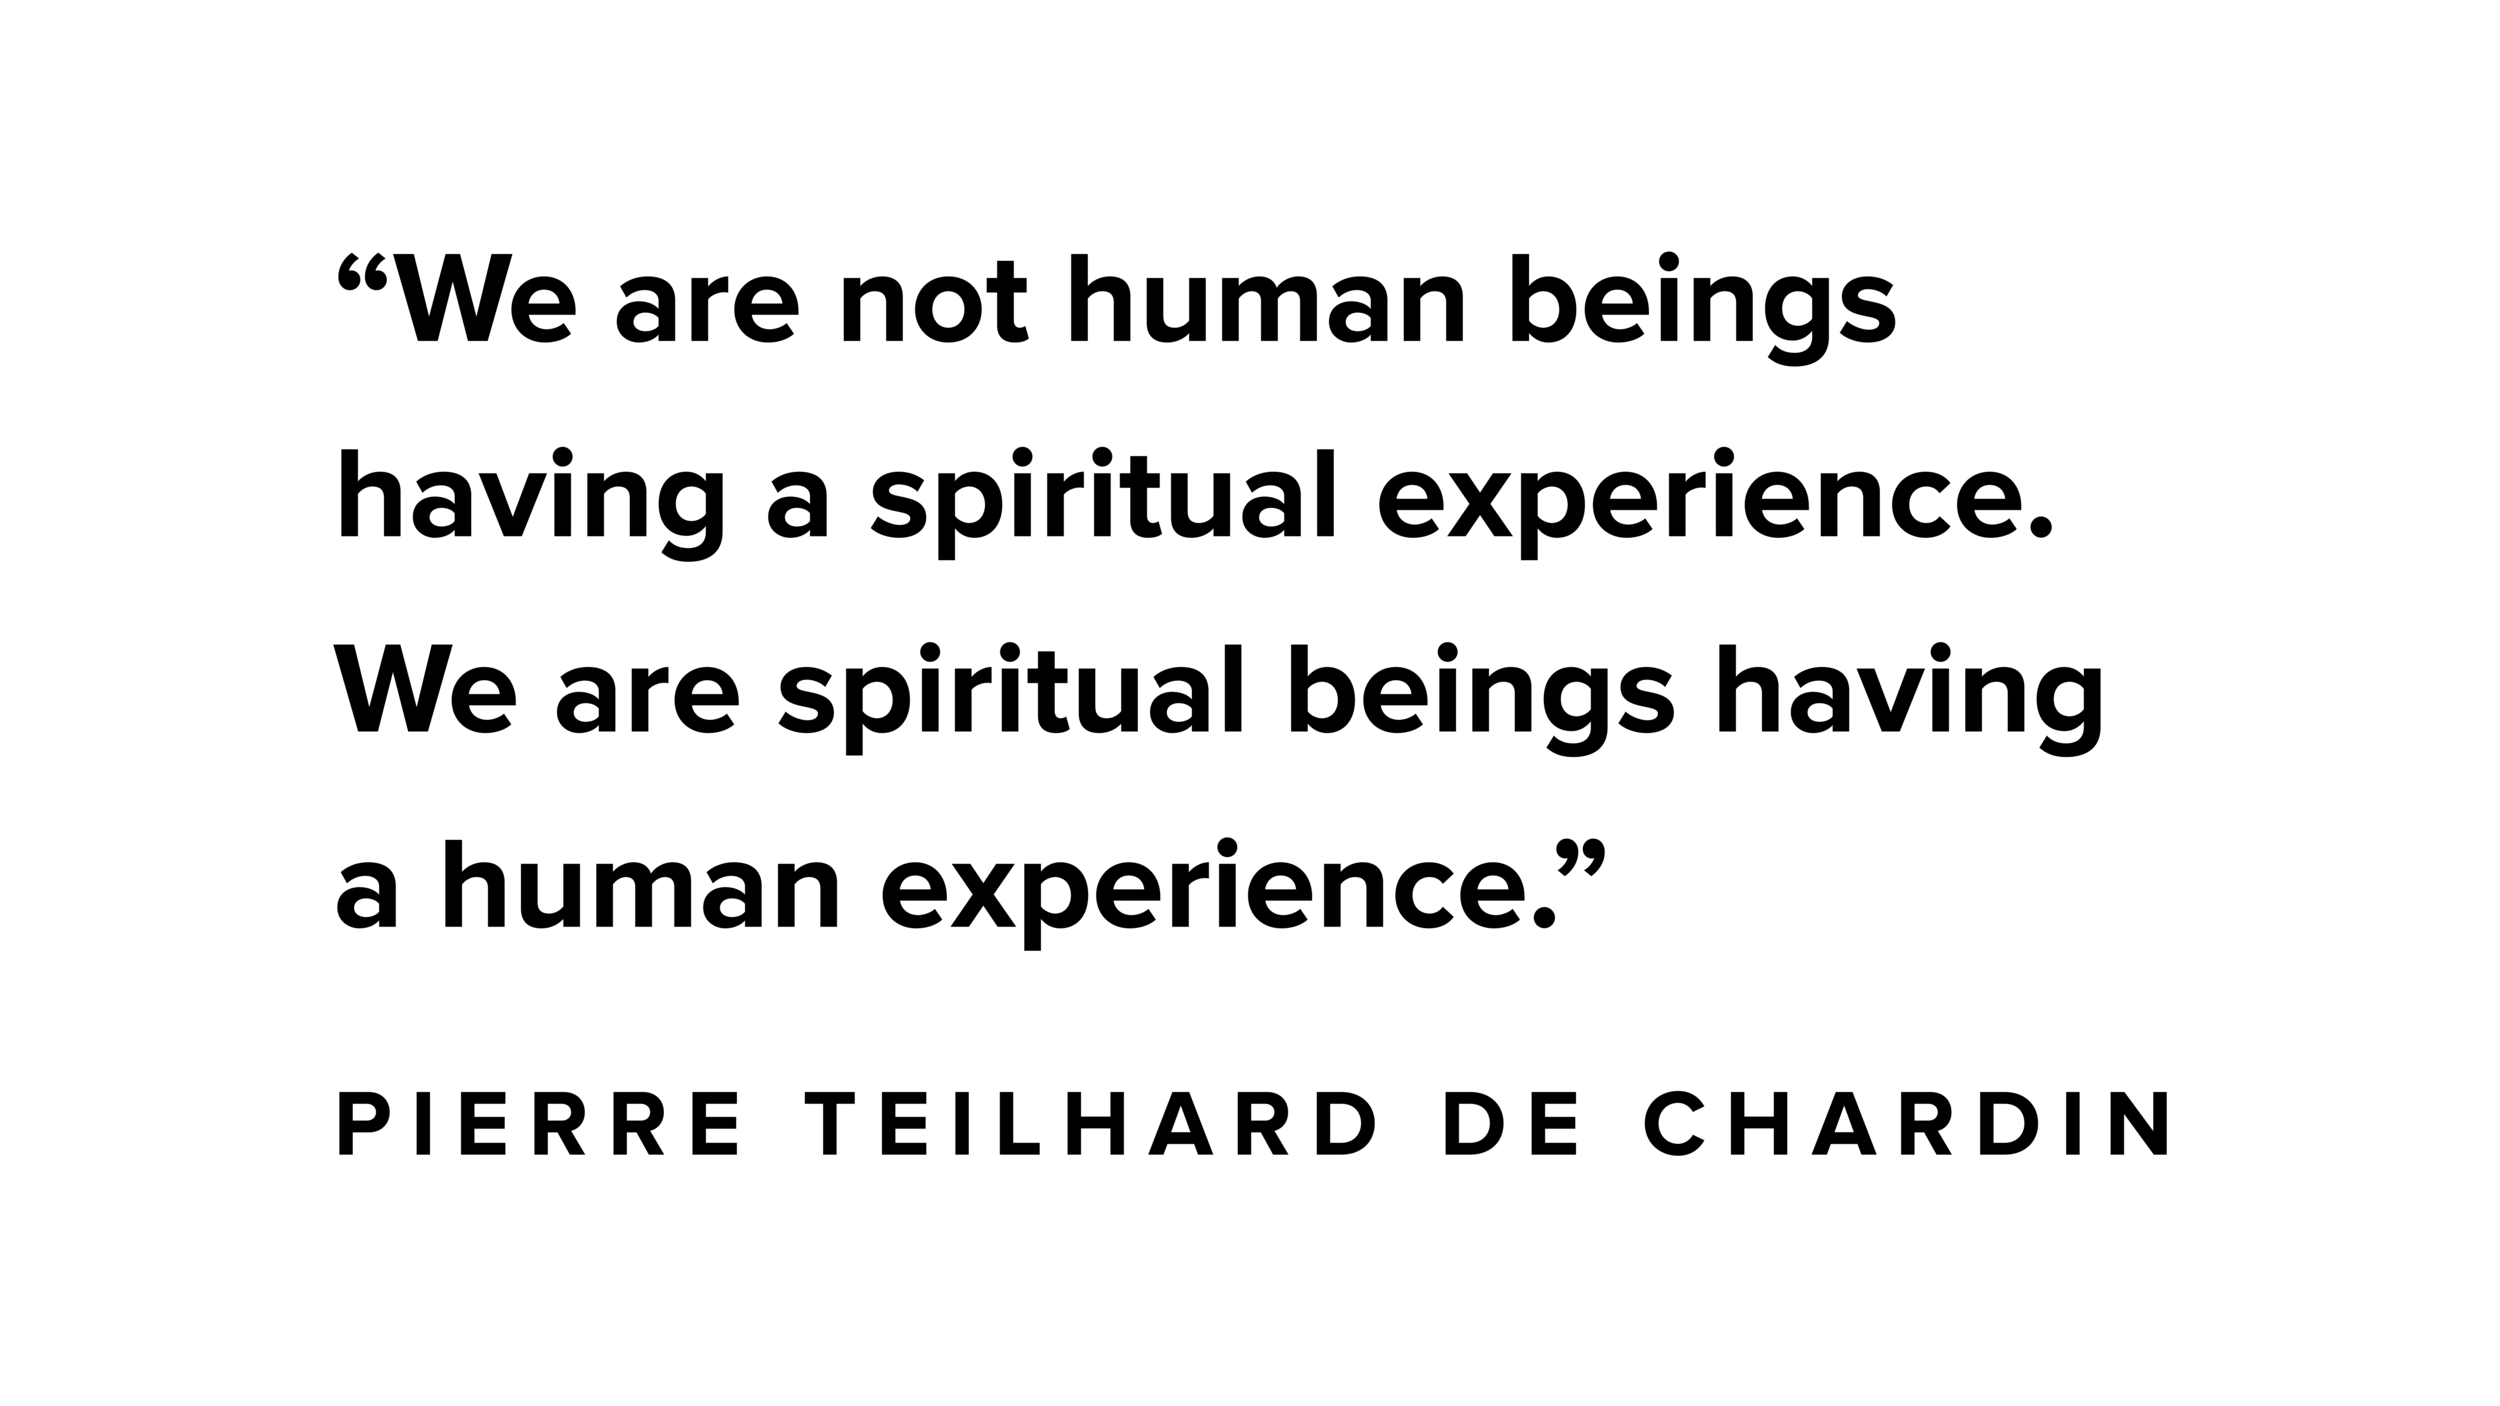 Chardin-01.png